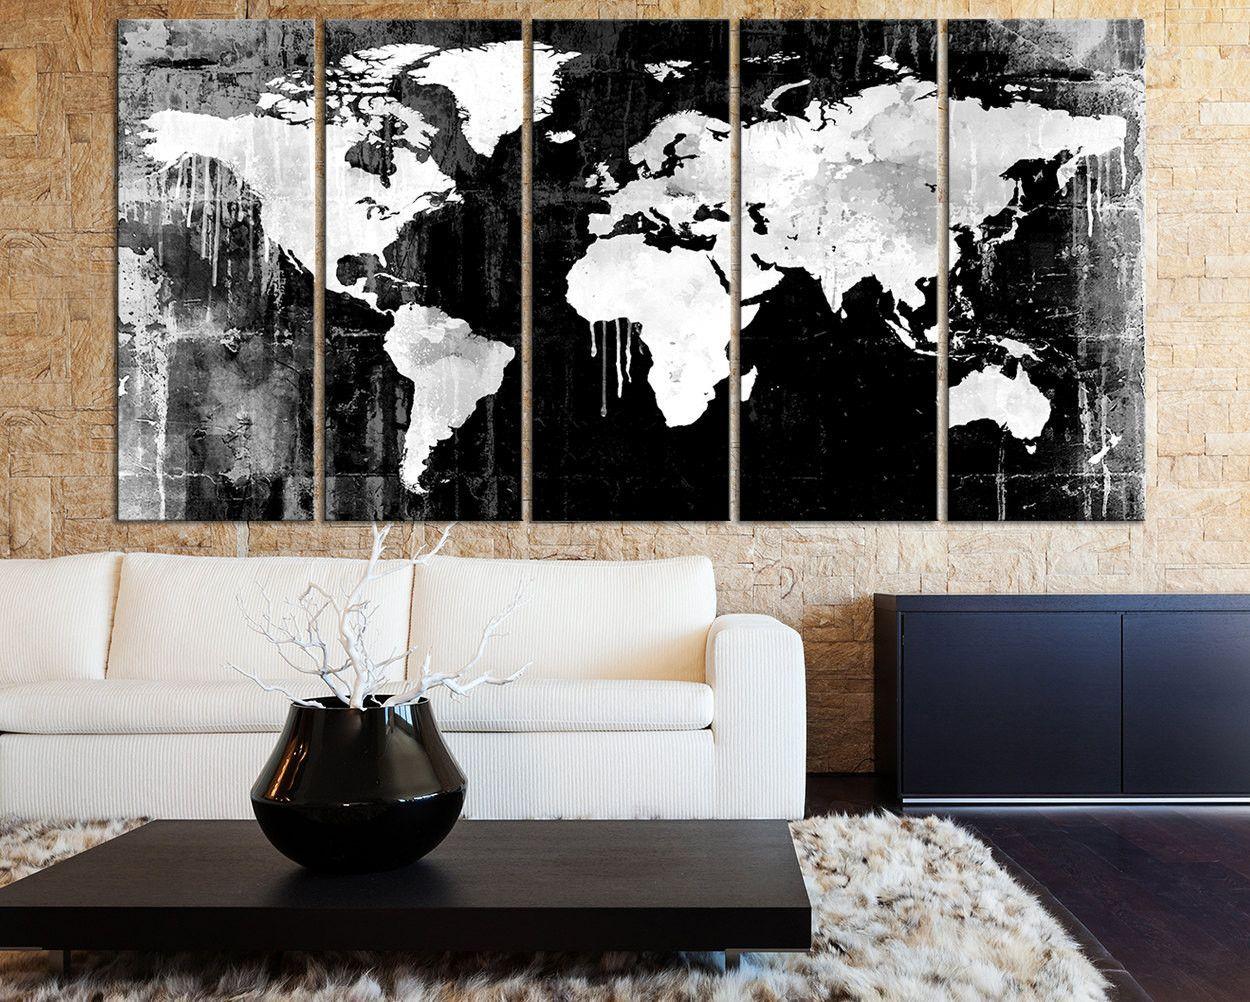 World map canvas art print black white watercolor world map 5 grayscale world map canvas art print black white watercolor world map 5 piece canvas art print ready gumiabroncs Gallery